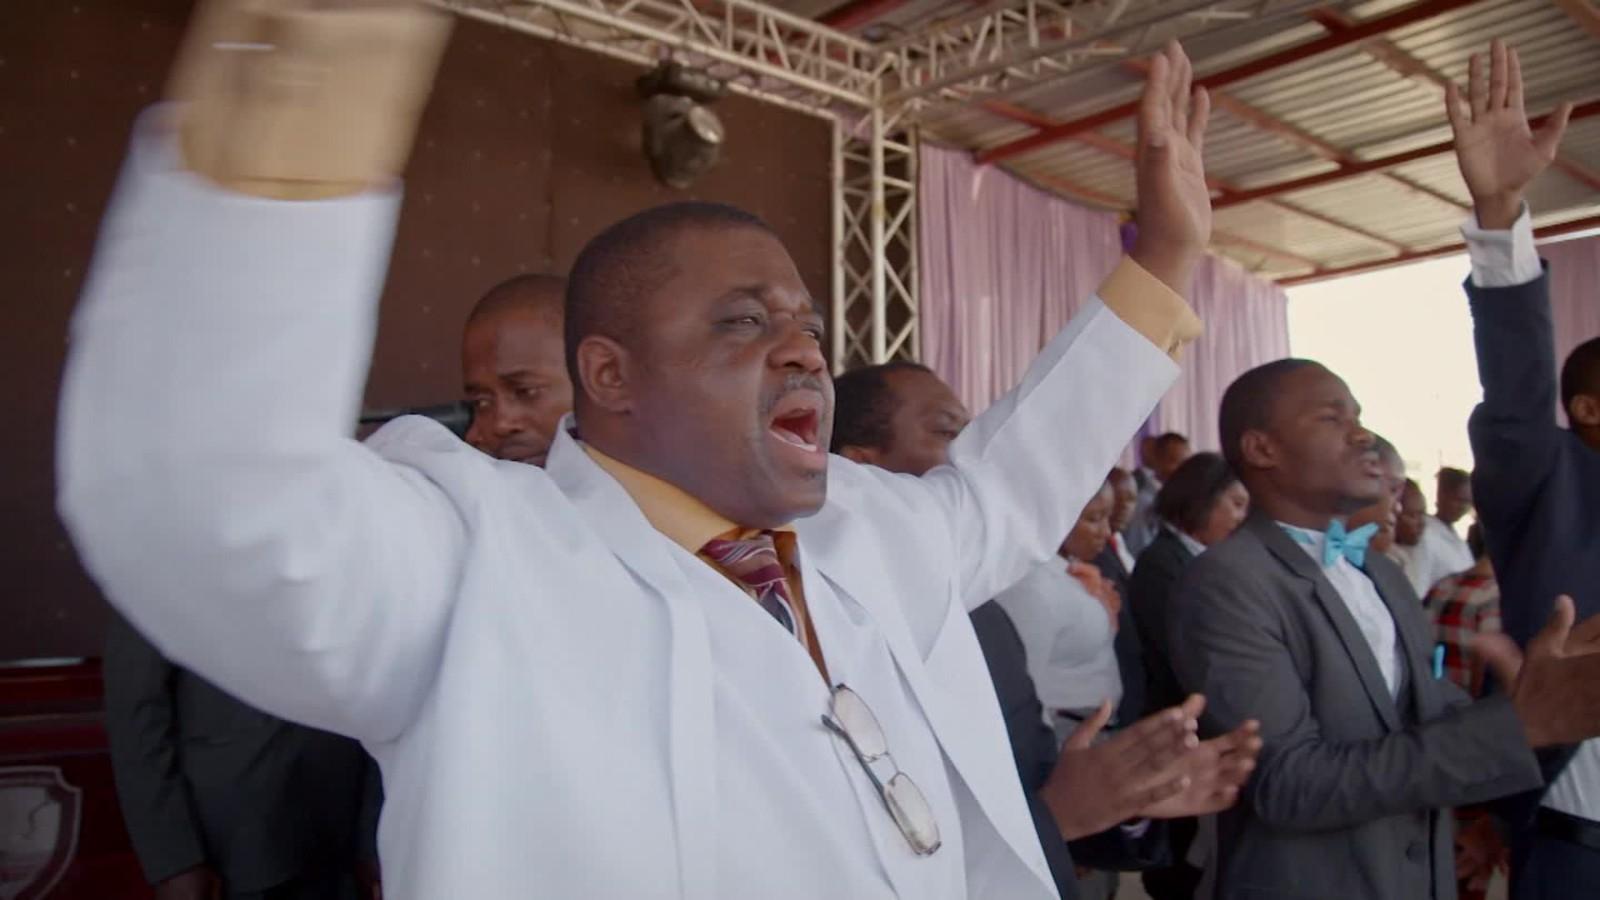 Evangelical Christianity's rise in Haiti